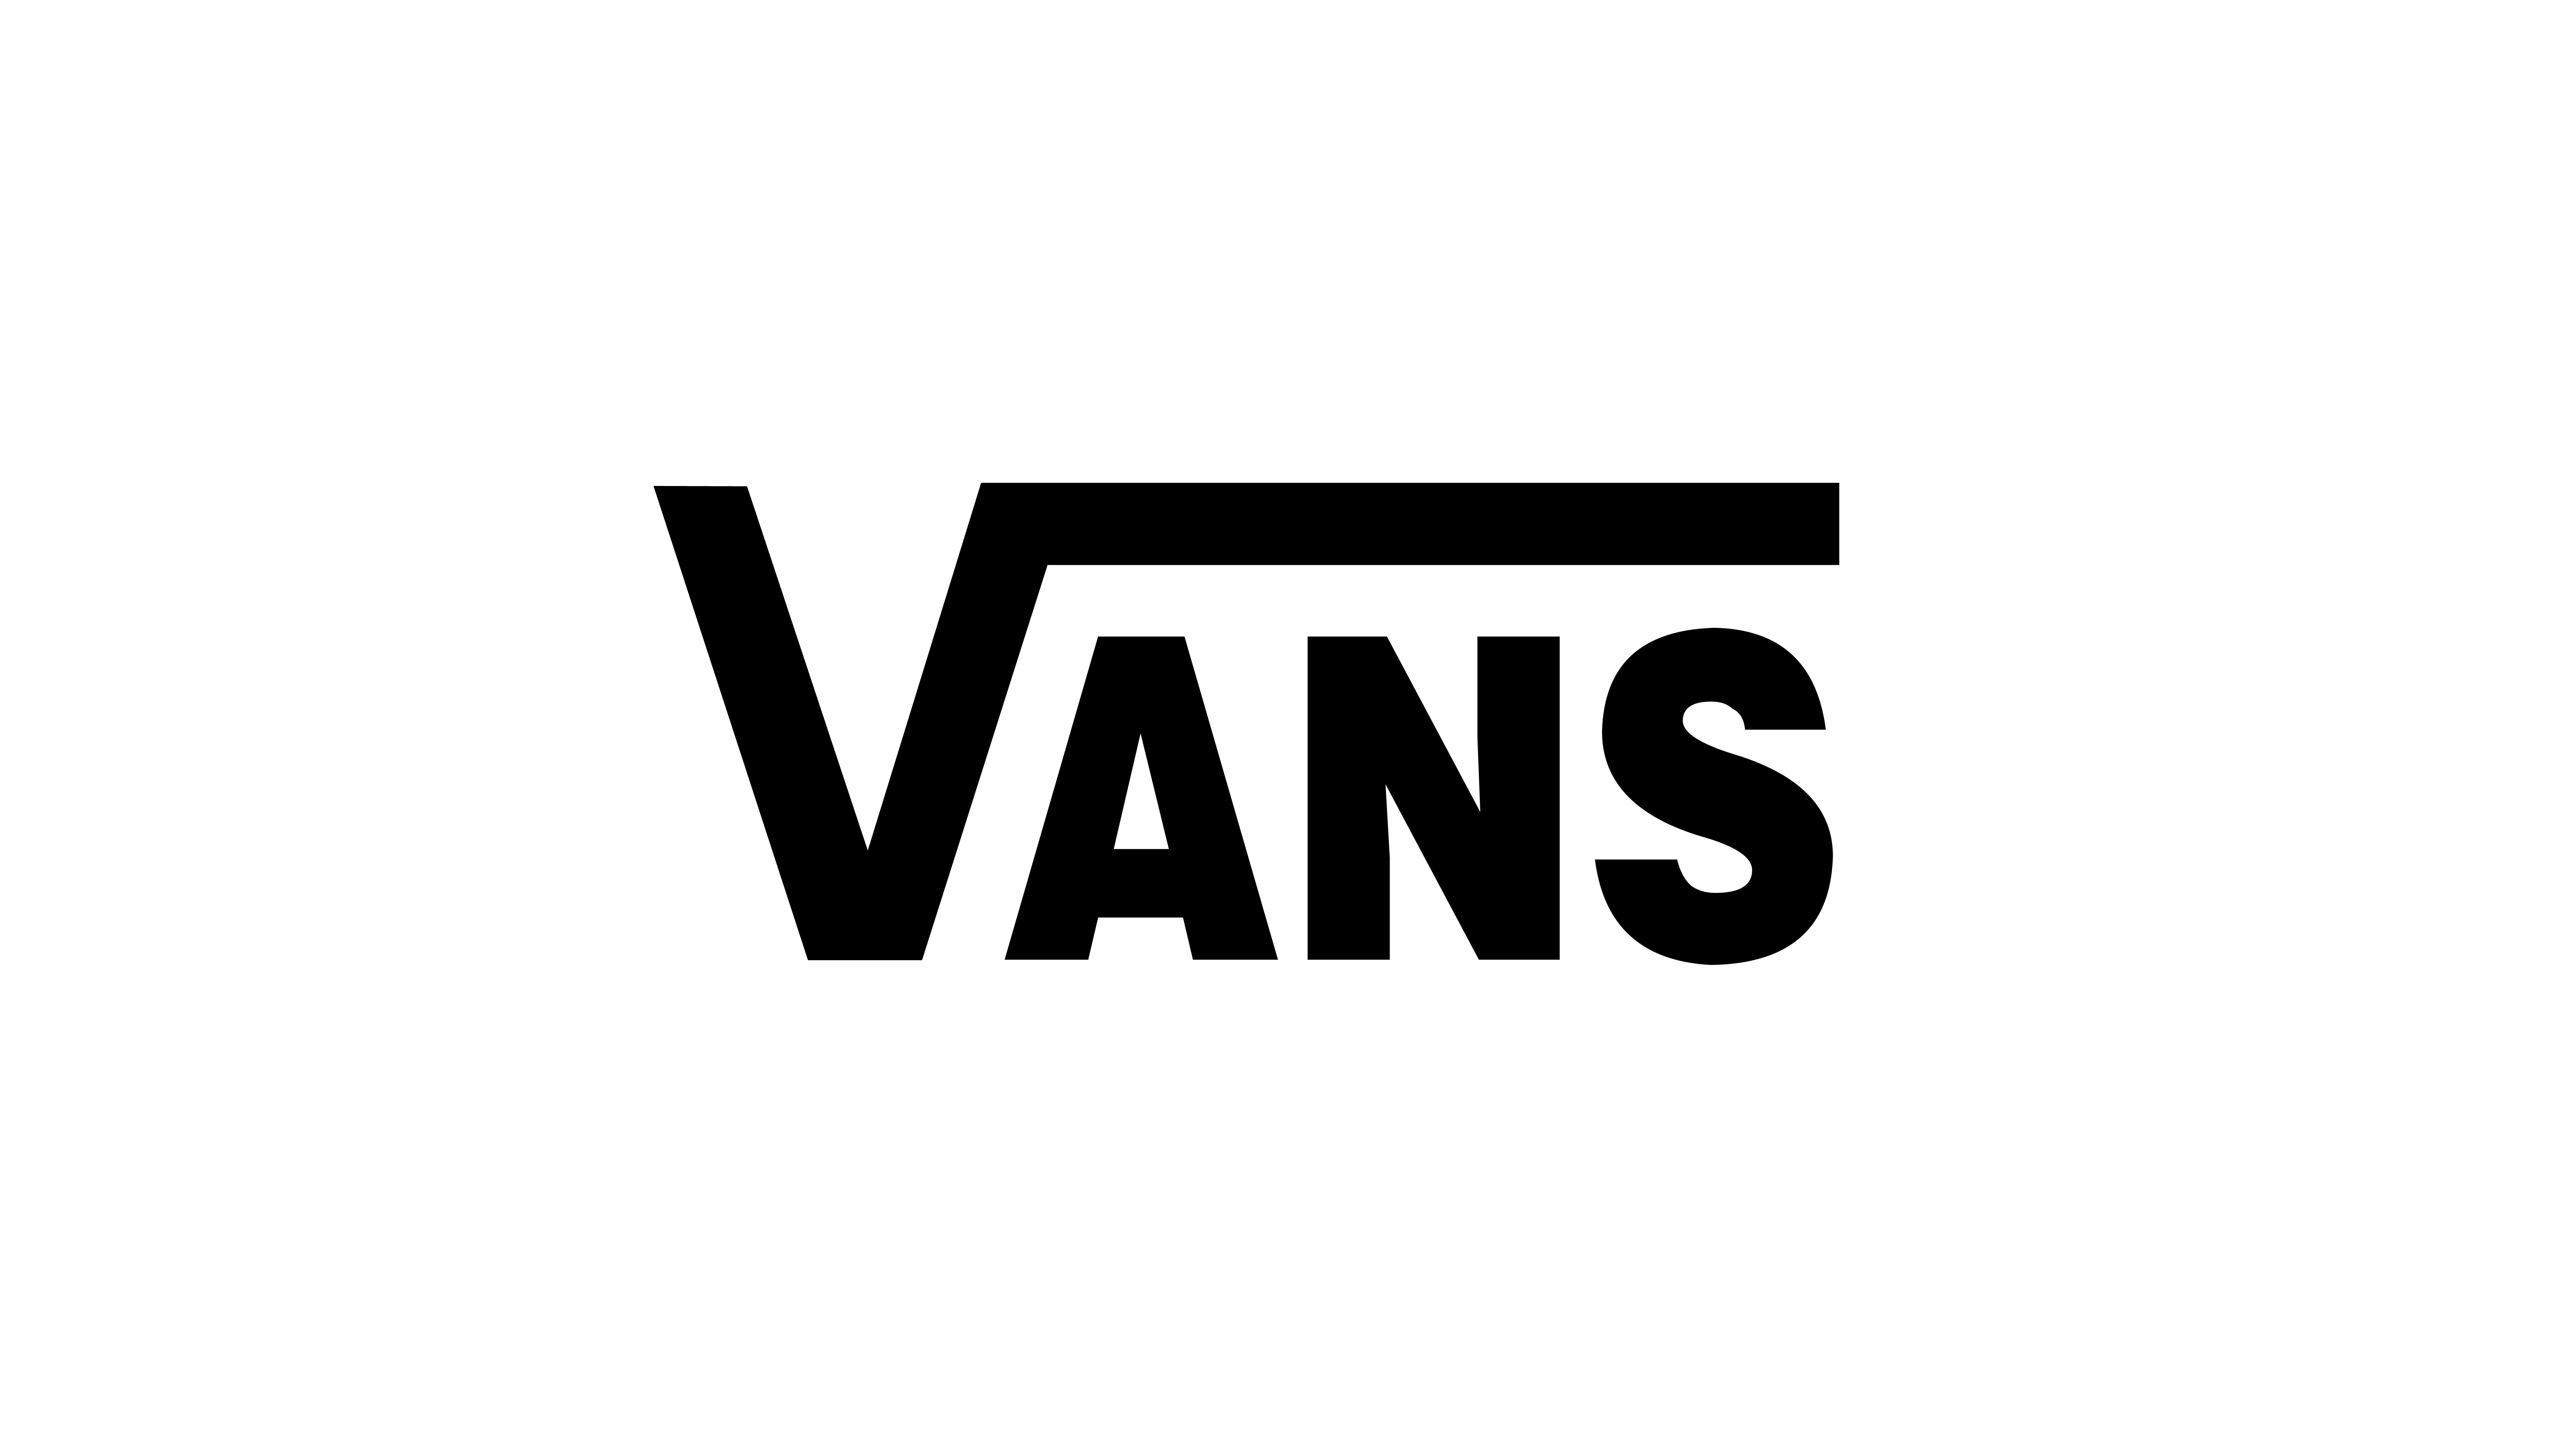 Fondos de pantalla Vans Logo en Fondo Blanco